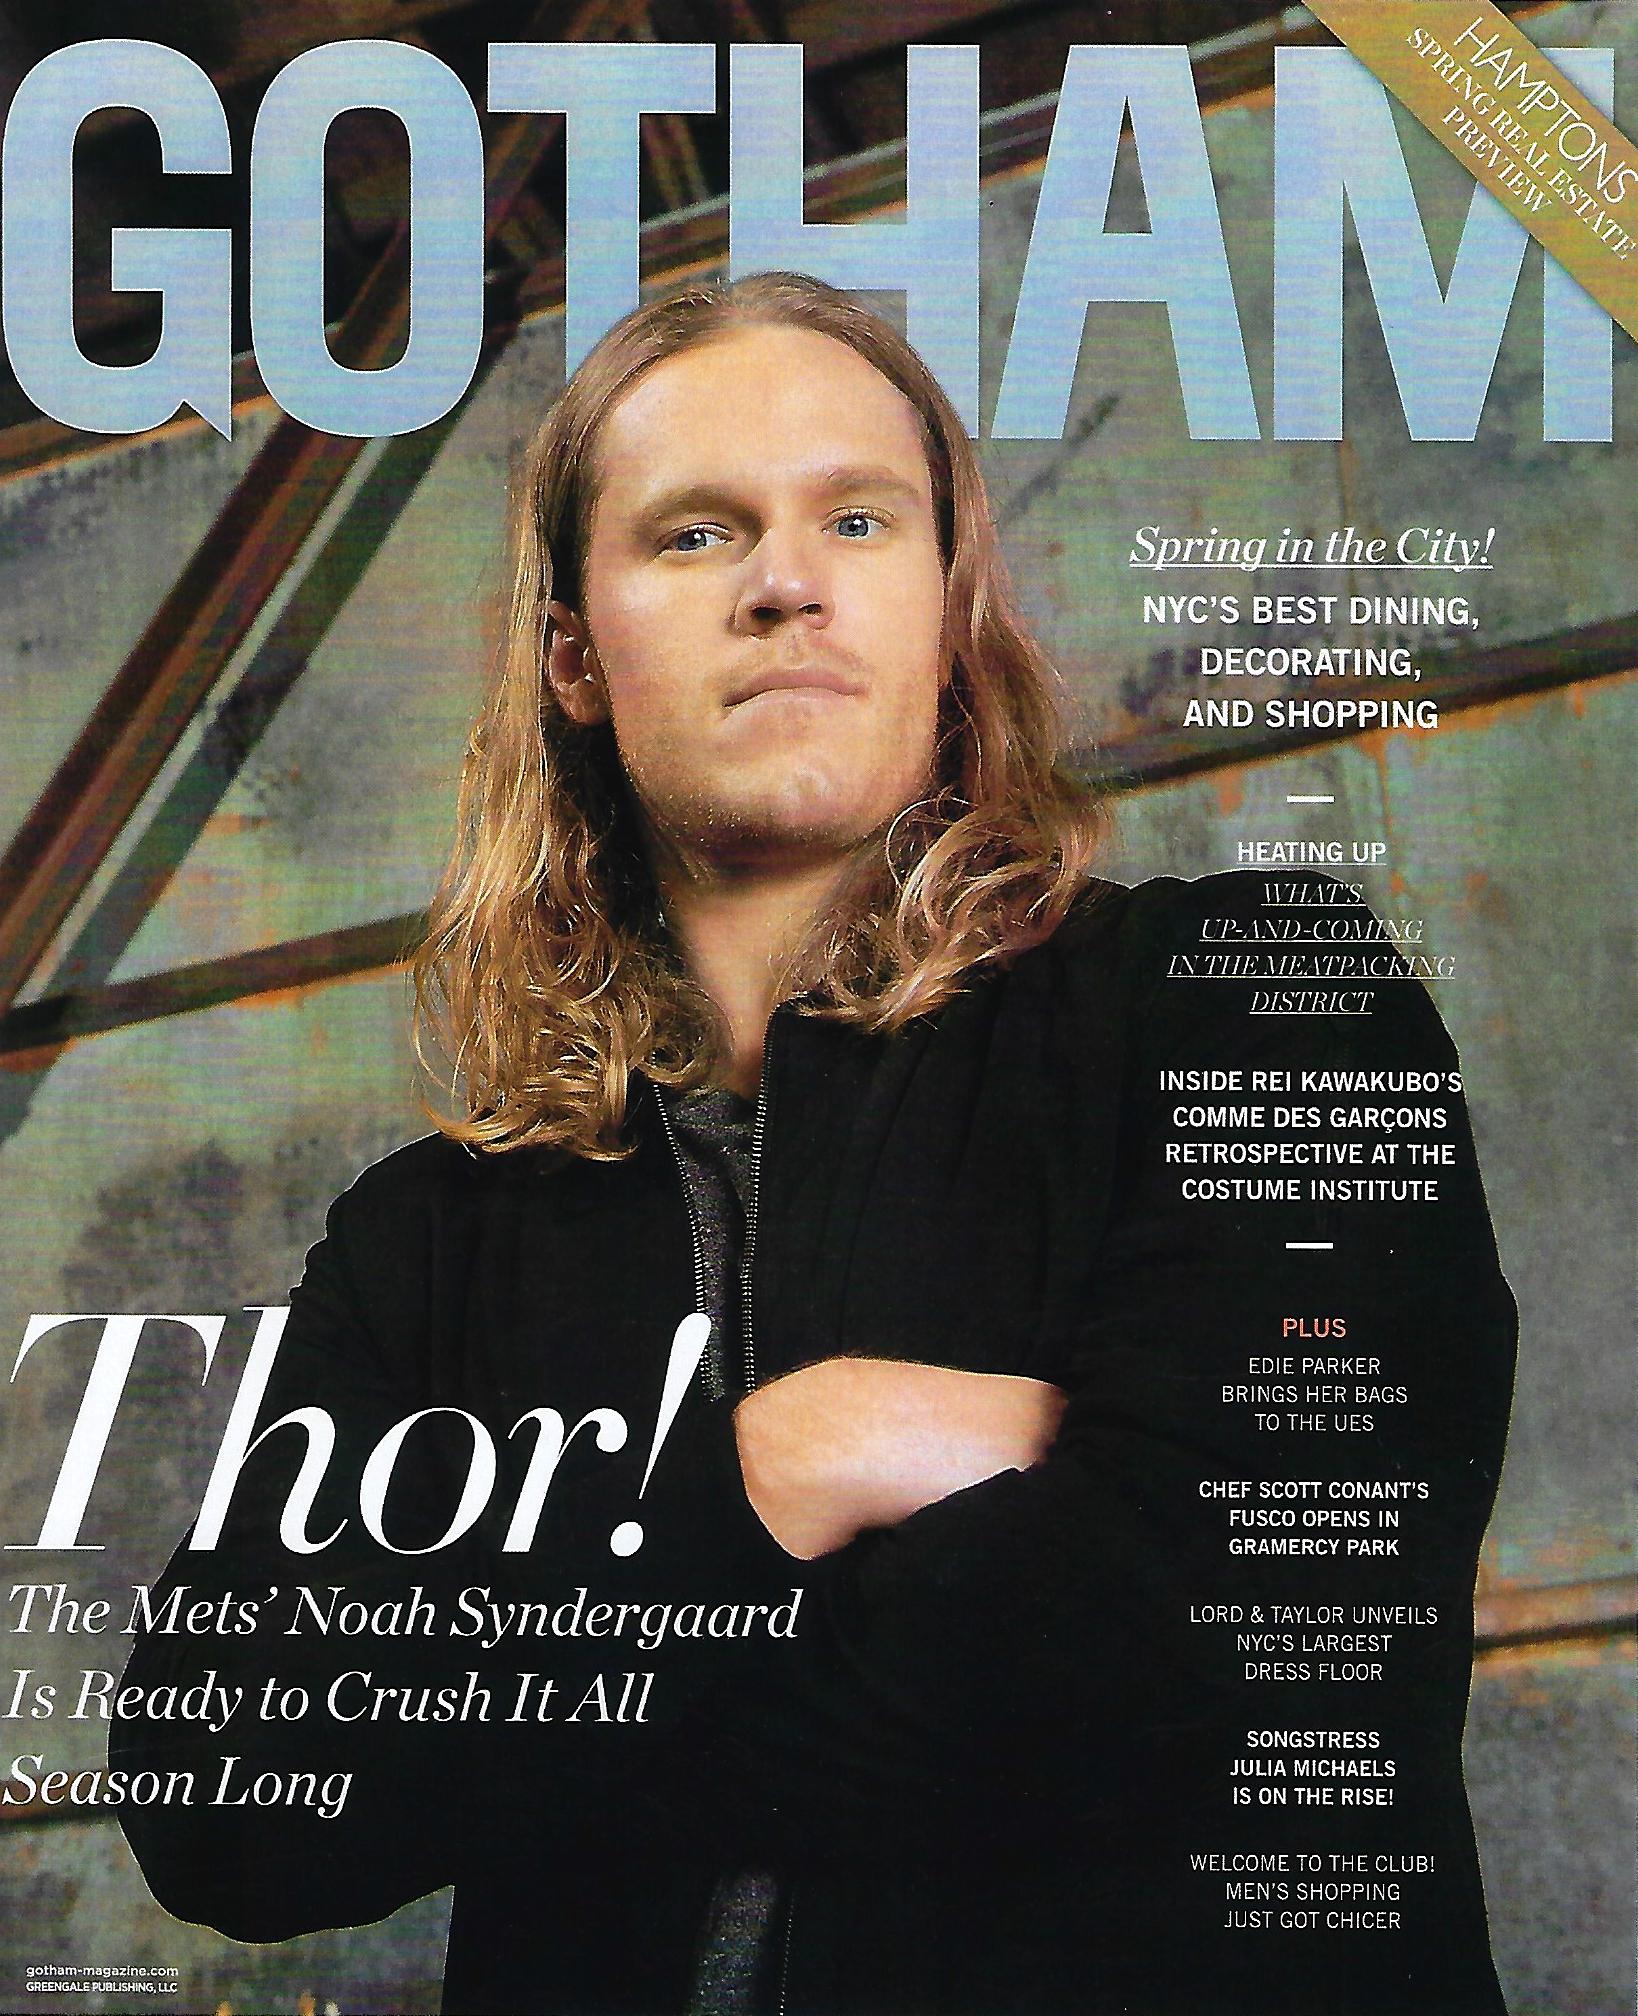 Gotham Magazine - Go Natural_cover_April 2017.jpg